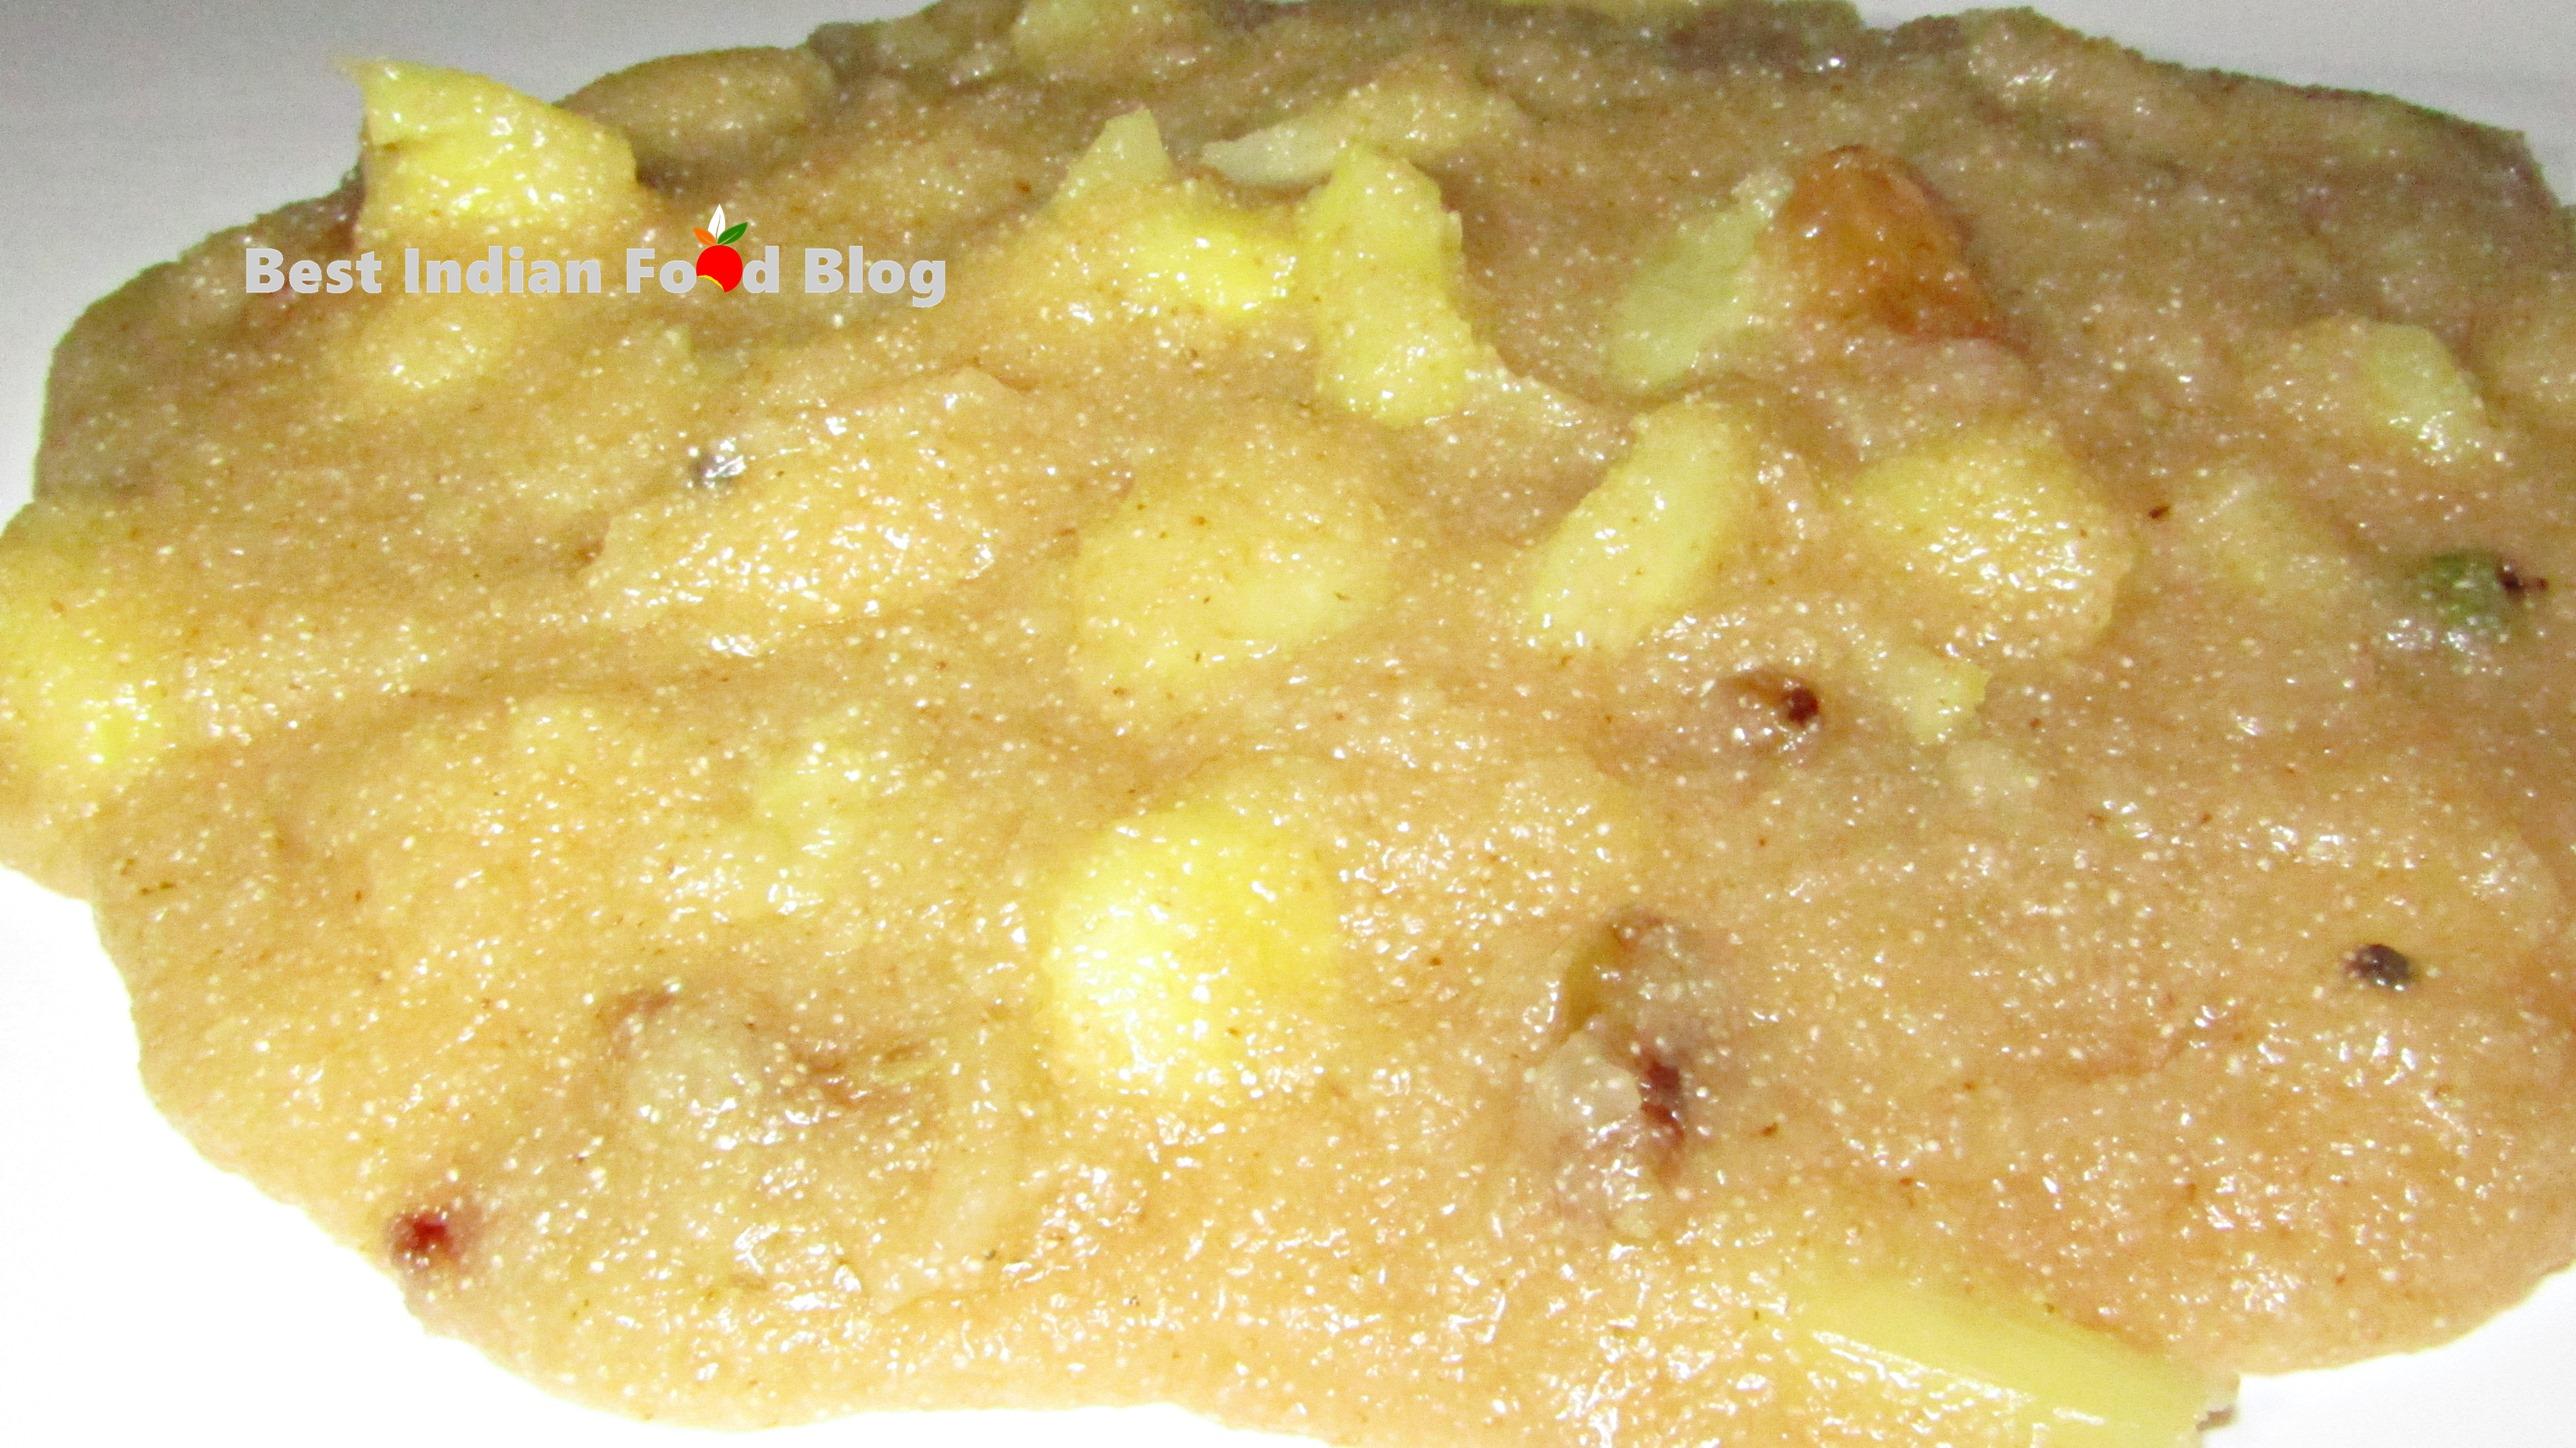 Annasi Kesari from Andaman and Nicobar Islands, India   Best Indian Food Blog